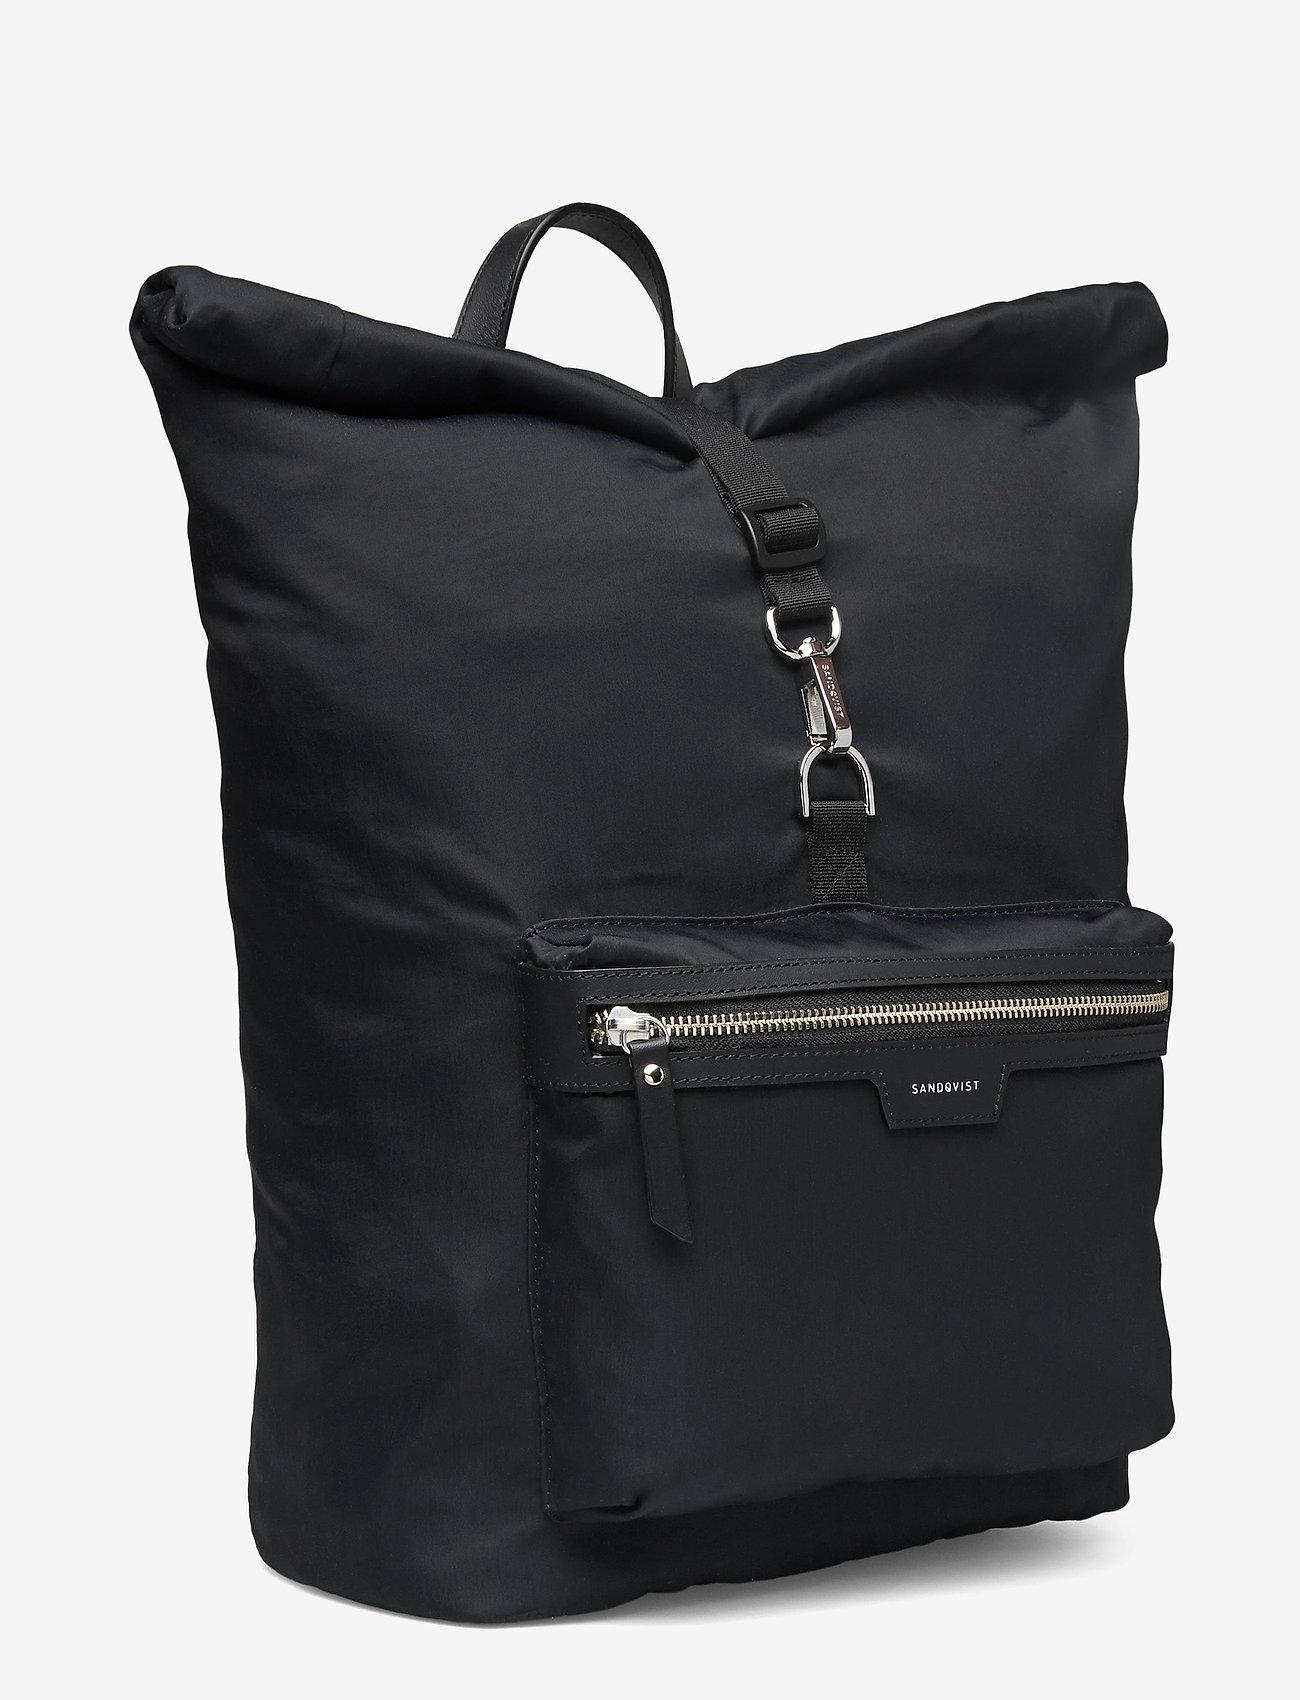 SANDQVIST - SIV - nieuwe mode - black with black leather - 3